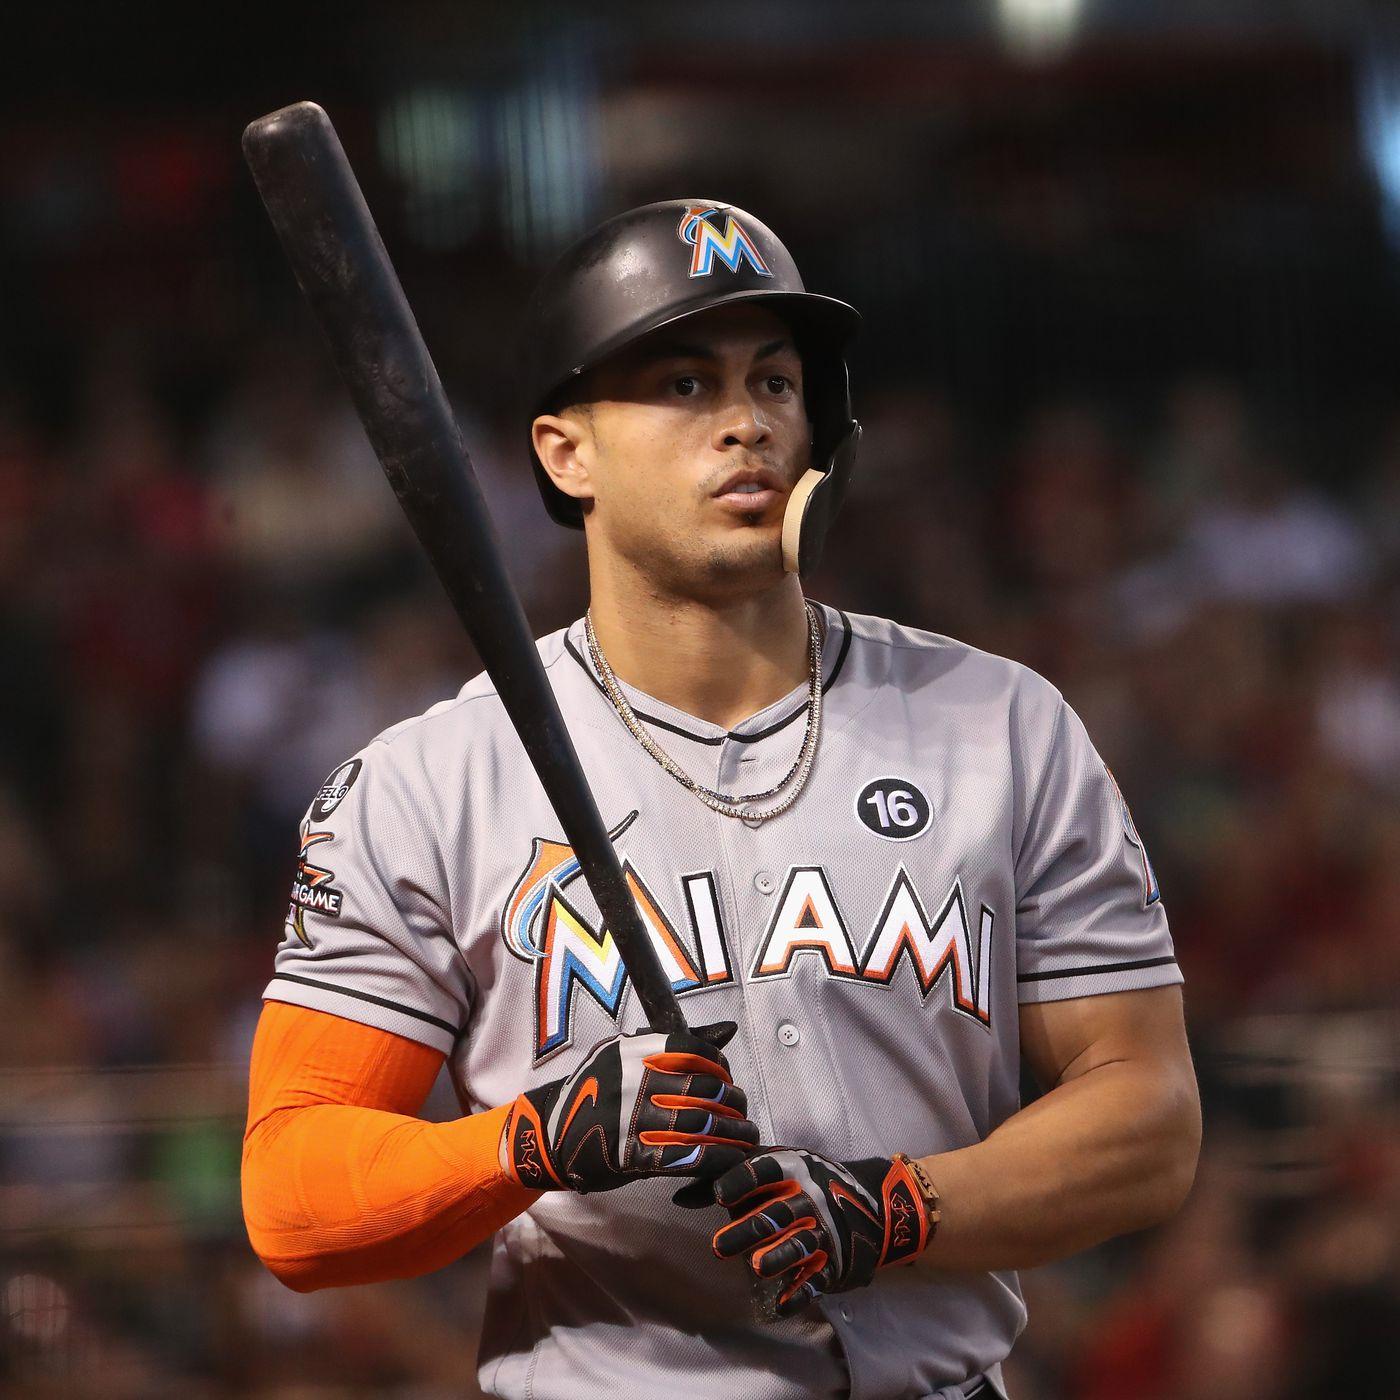 The Miami Marlins  Giancarlo Stanton Trade Is a Baseball Disgrace ... 21f259e4b